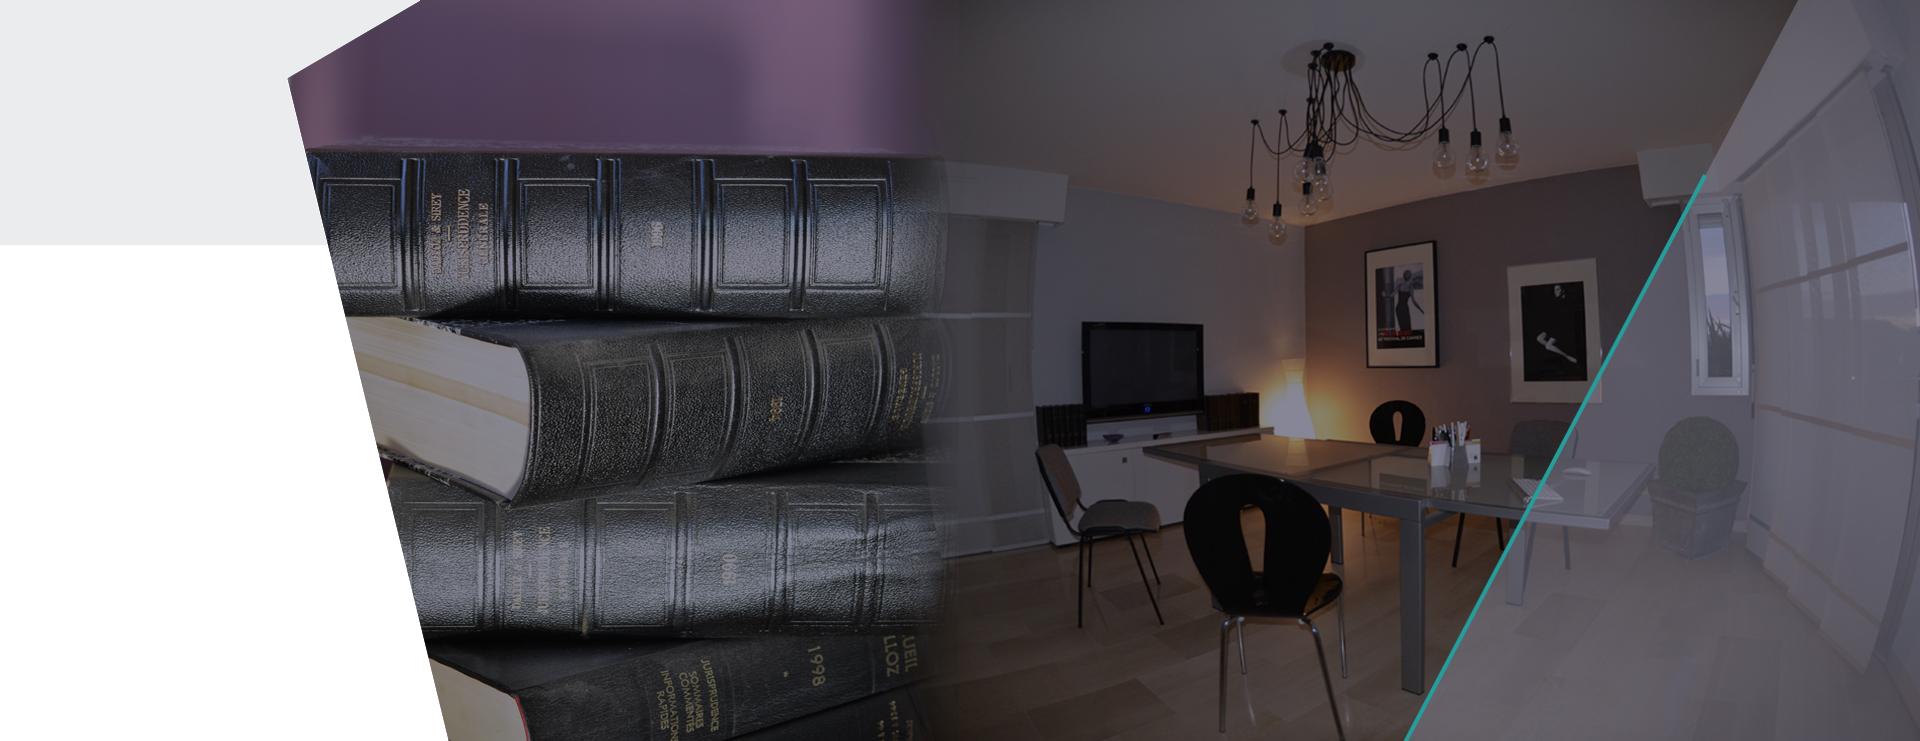 Cabinet bonzanini avocats et associés